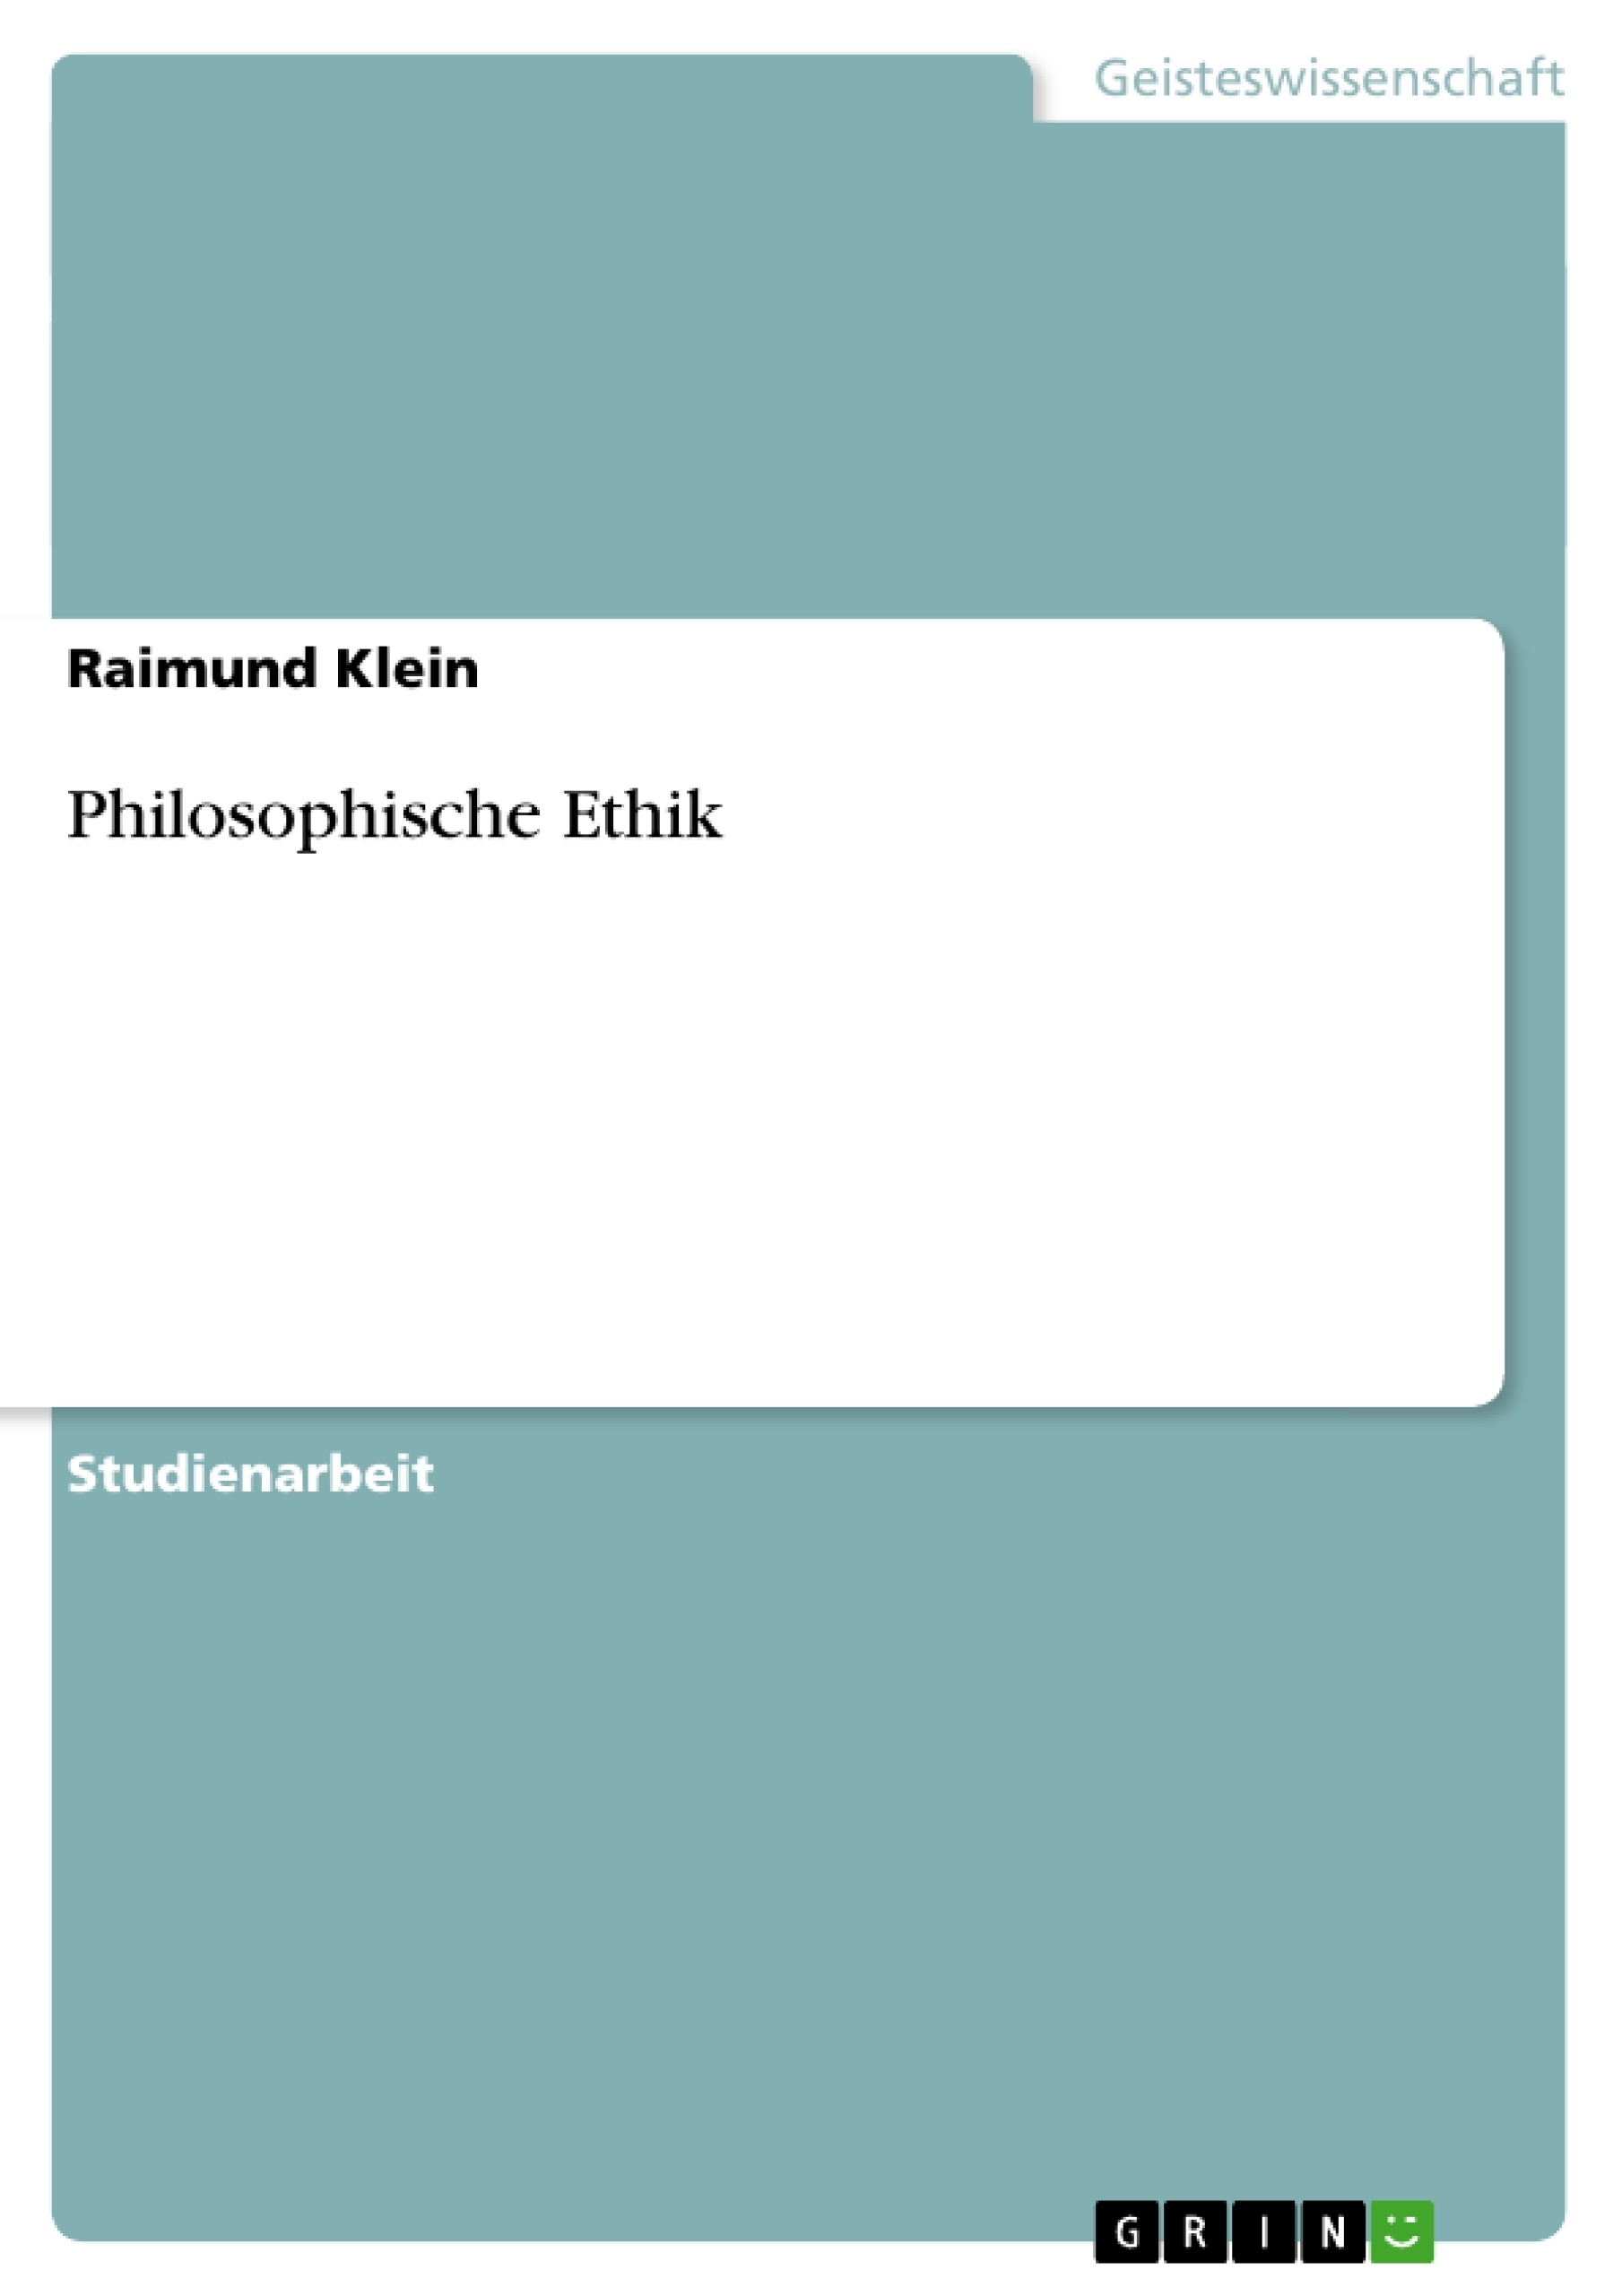 Titel: Philosophische Ethik